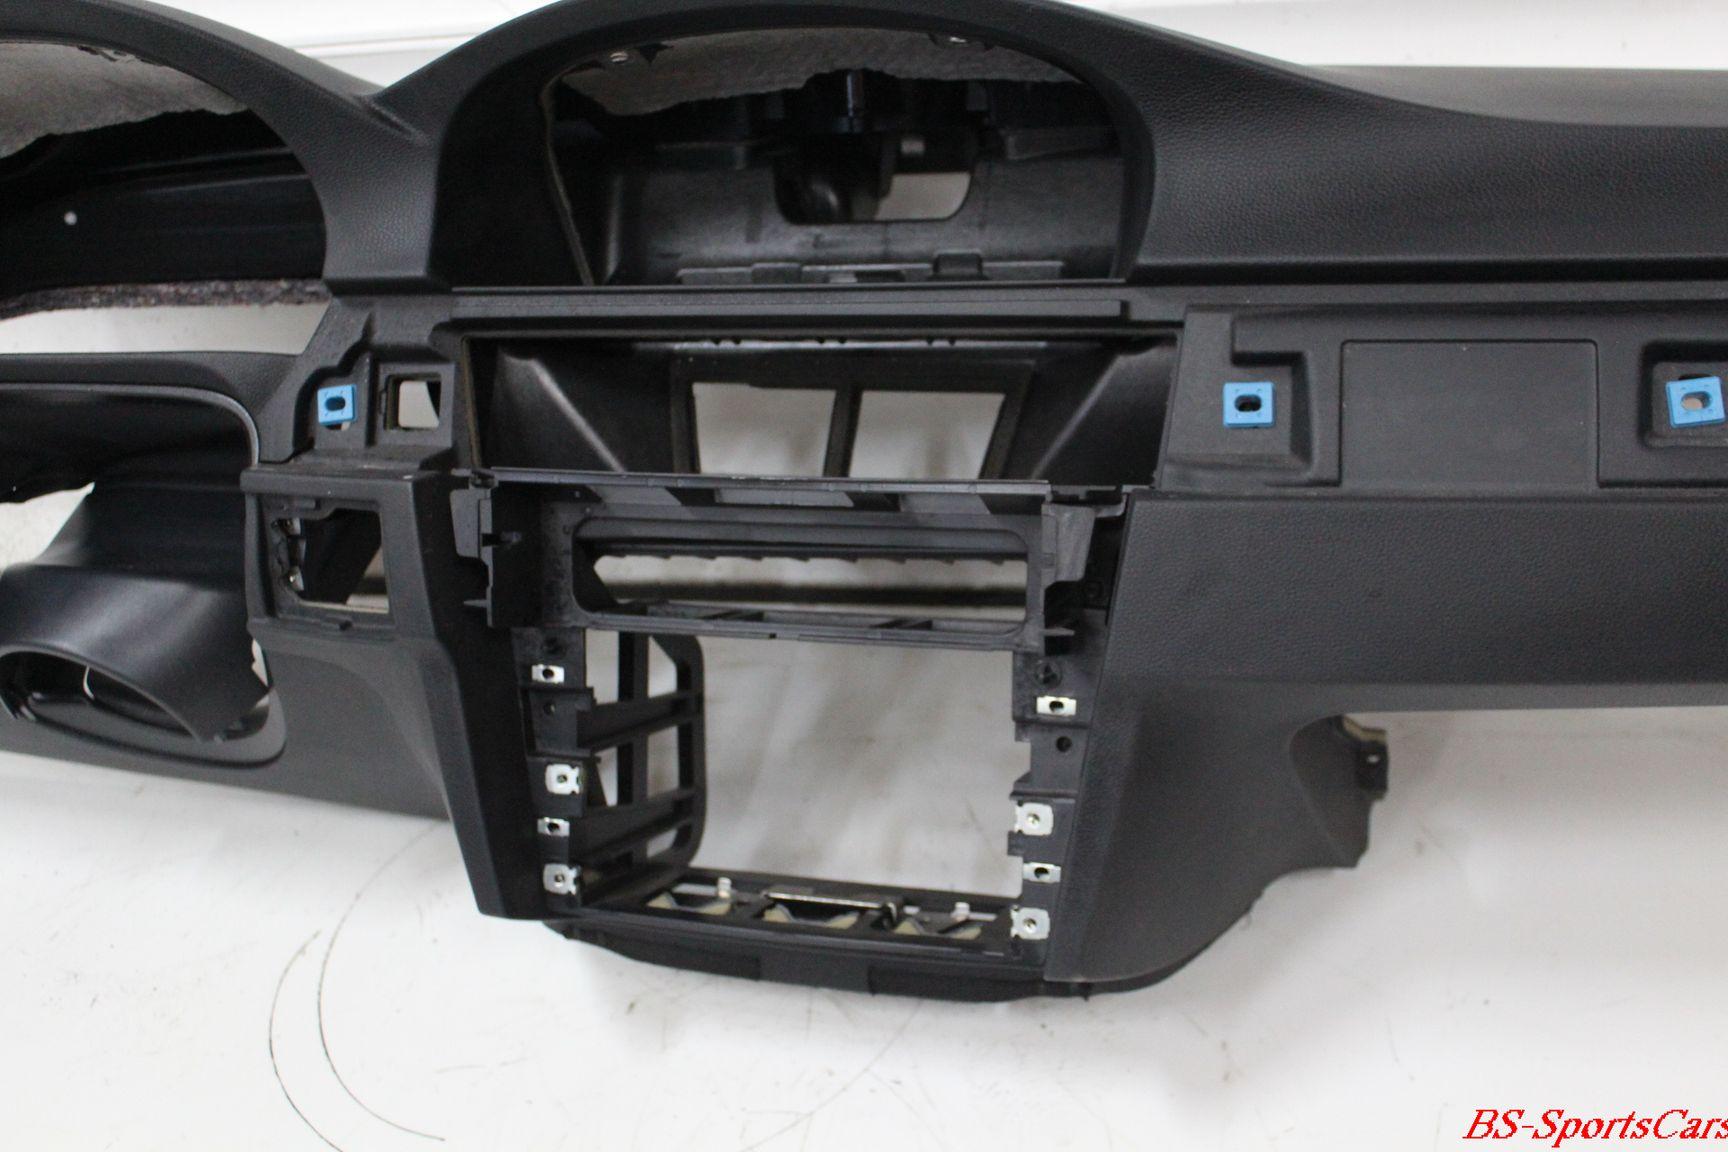 Bmw E92 E91 E93 E90 3er Armaturenbrett Schwarz Navi Cockpit | eBay | {Armaturenbrett bmw 60}